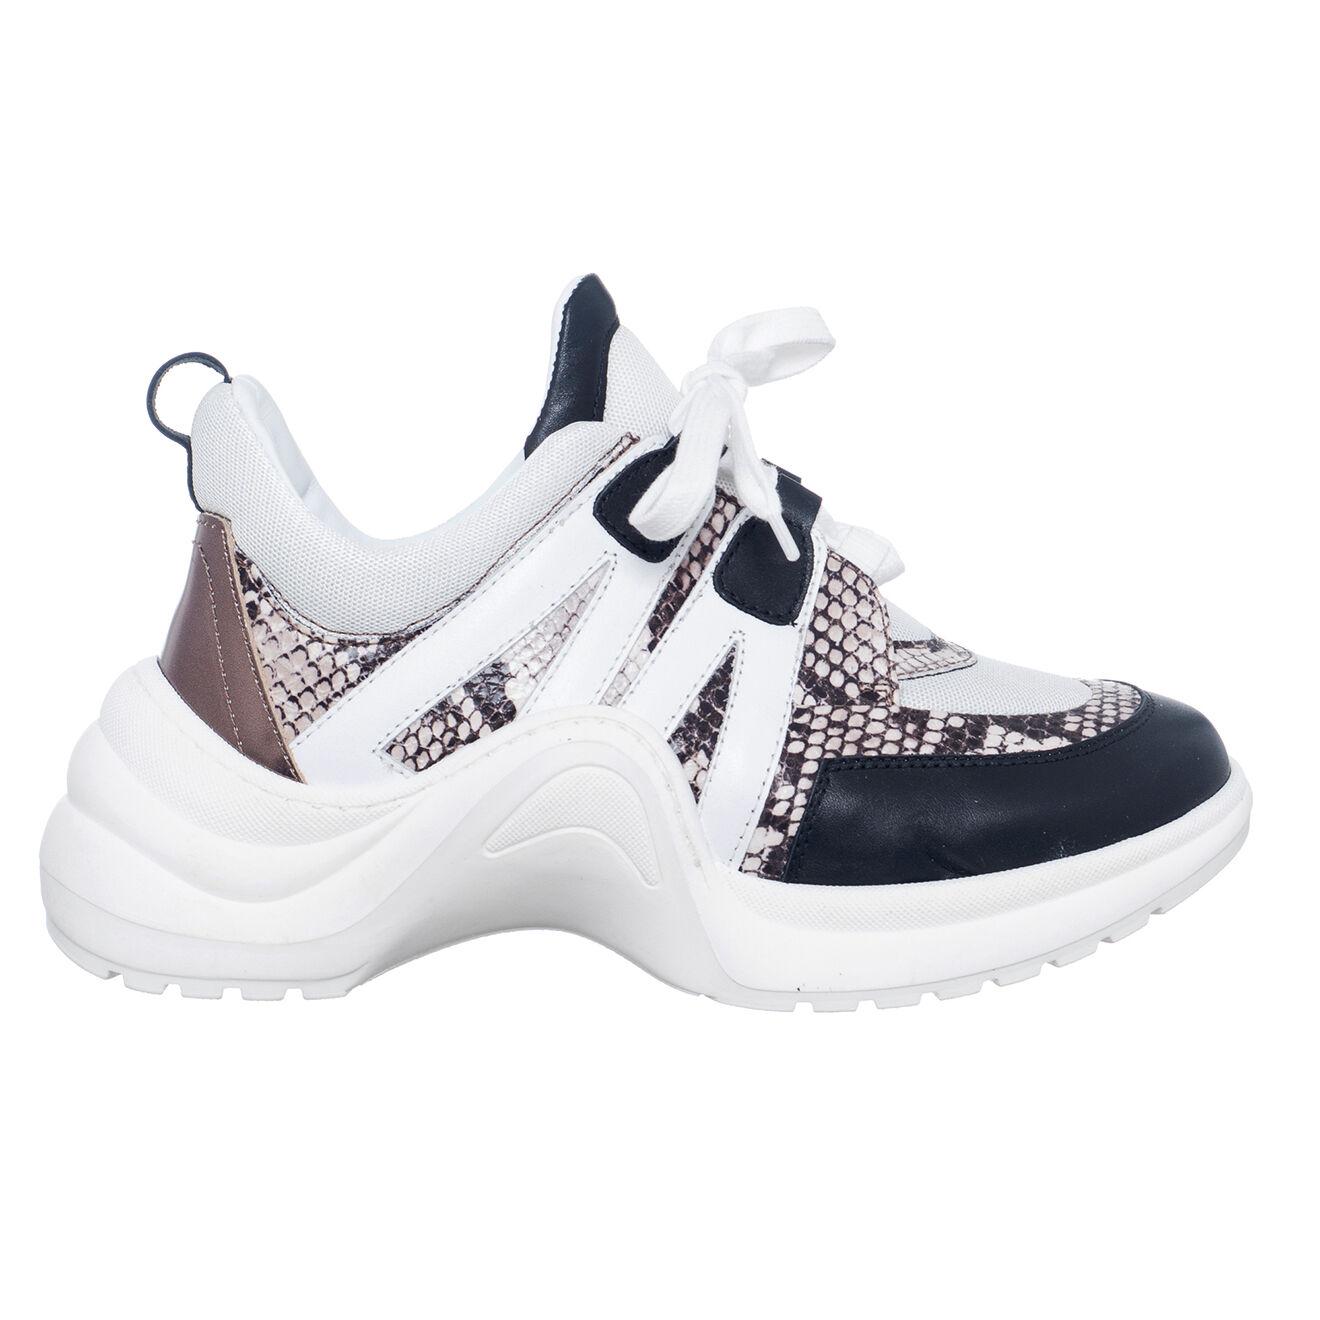 Sneakers en Cuir Bianca blanc/noir/python - Talon 5 cm - Loretta Pettinari - Modalova